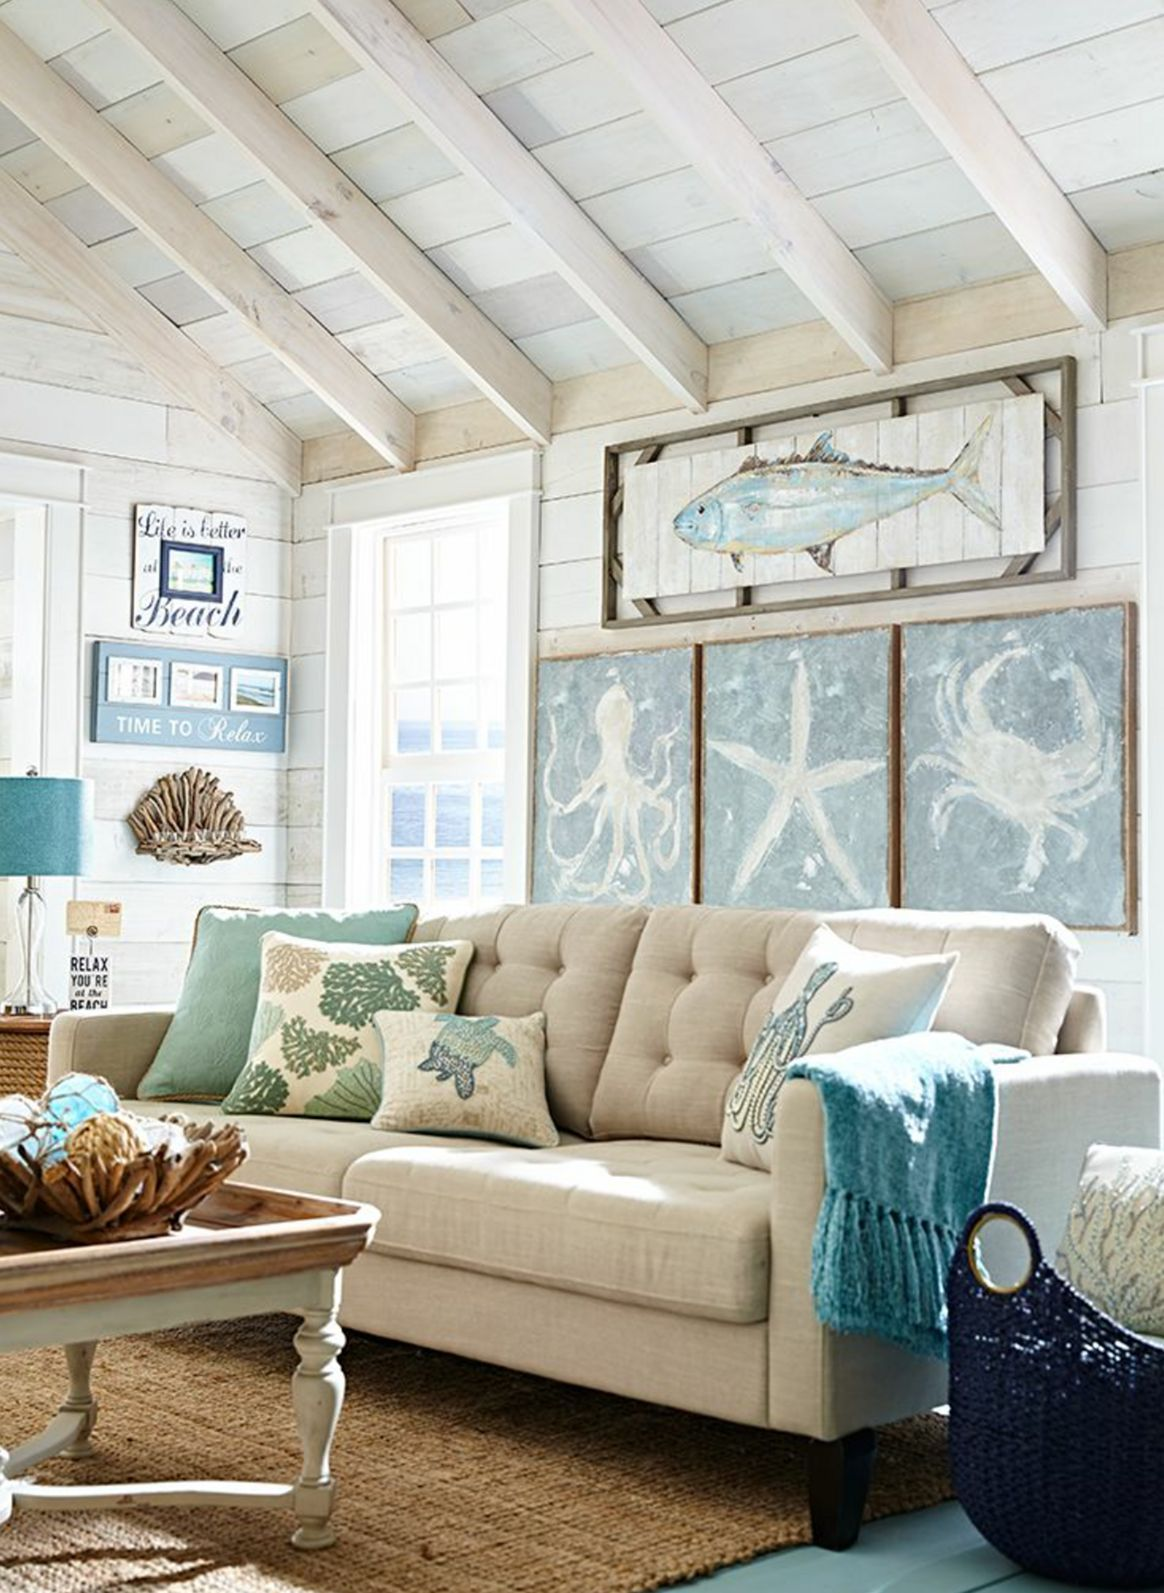 15 Impressive Coastal Living Room Design Ideas Decor It S Coastal Decorating Living Room Beachy Living Room Farmhouse Decor Living Room Coastal design living room